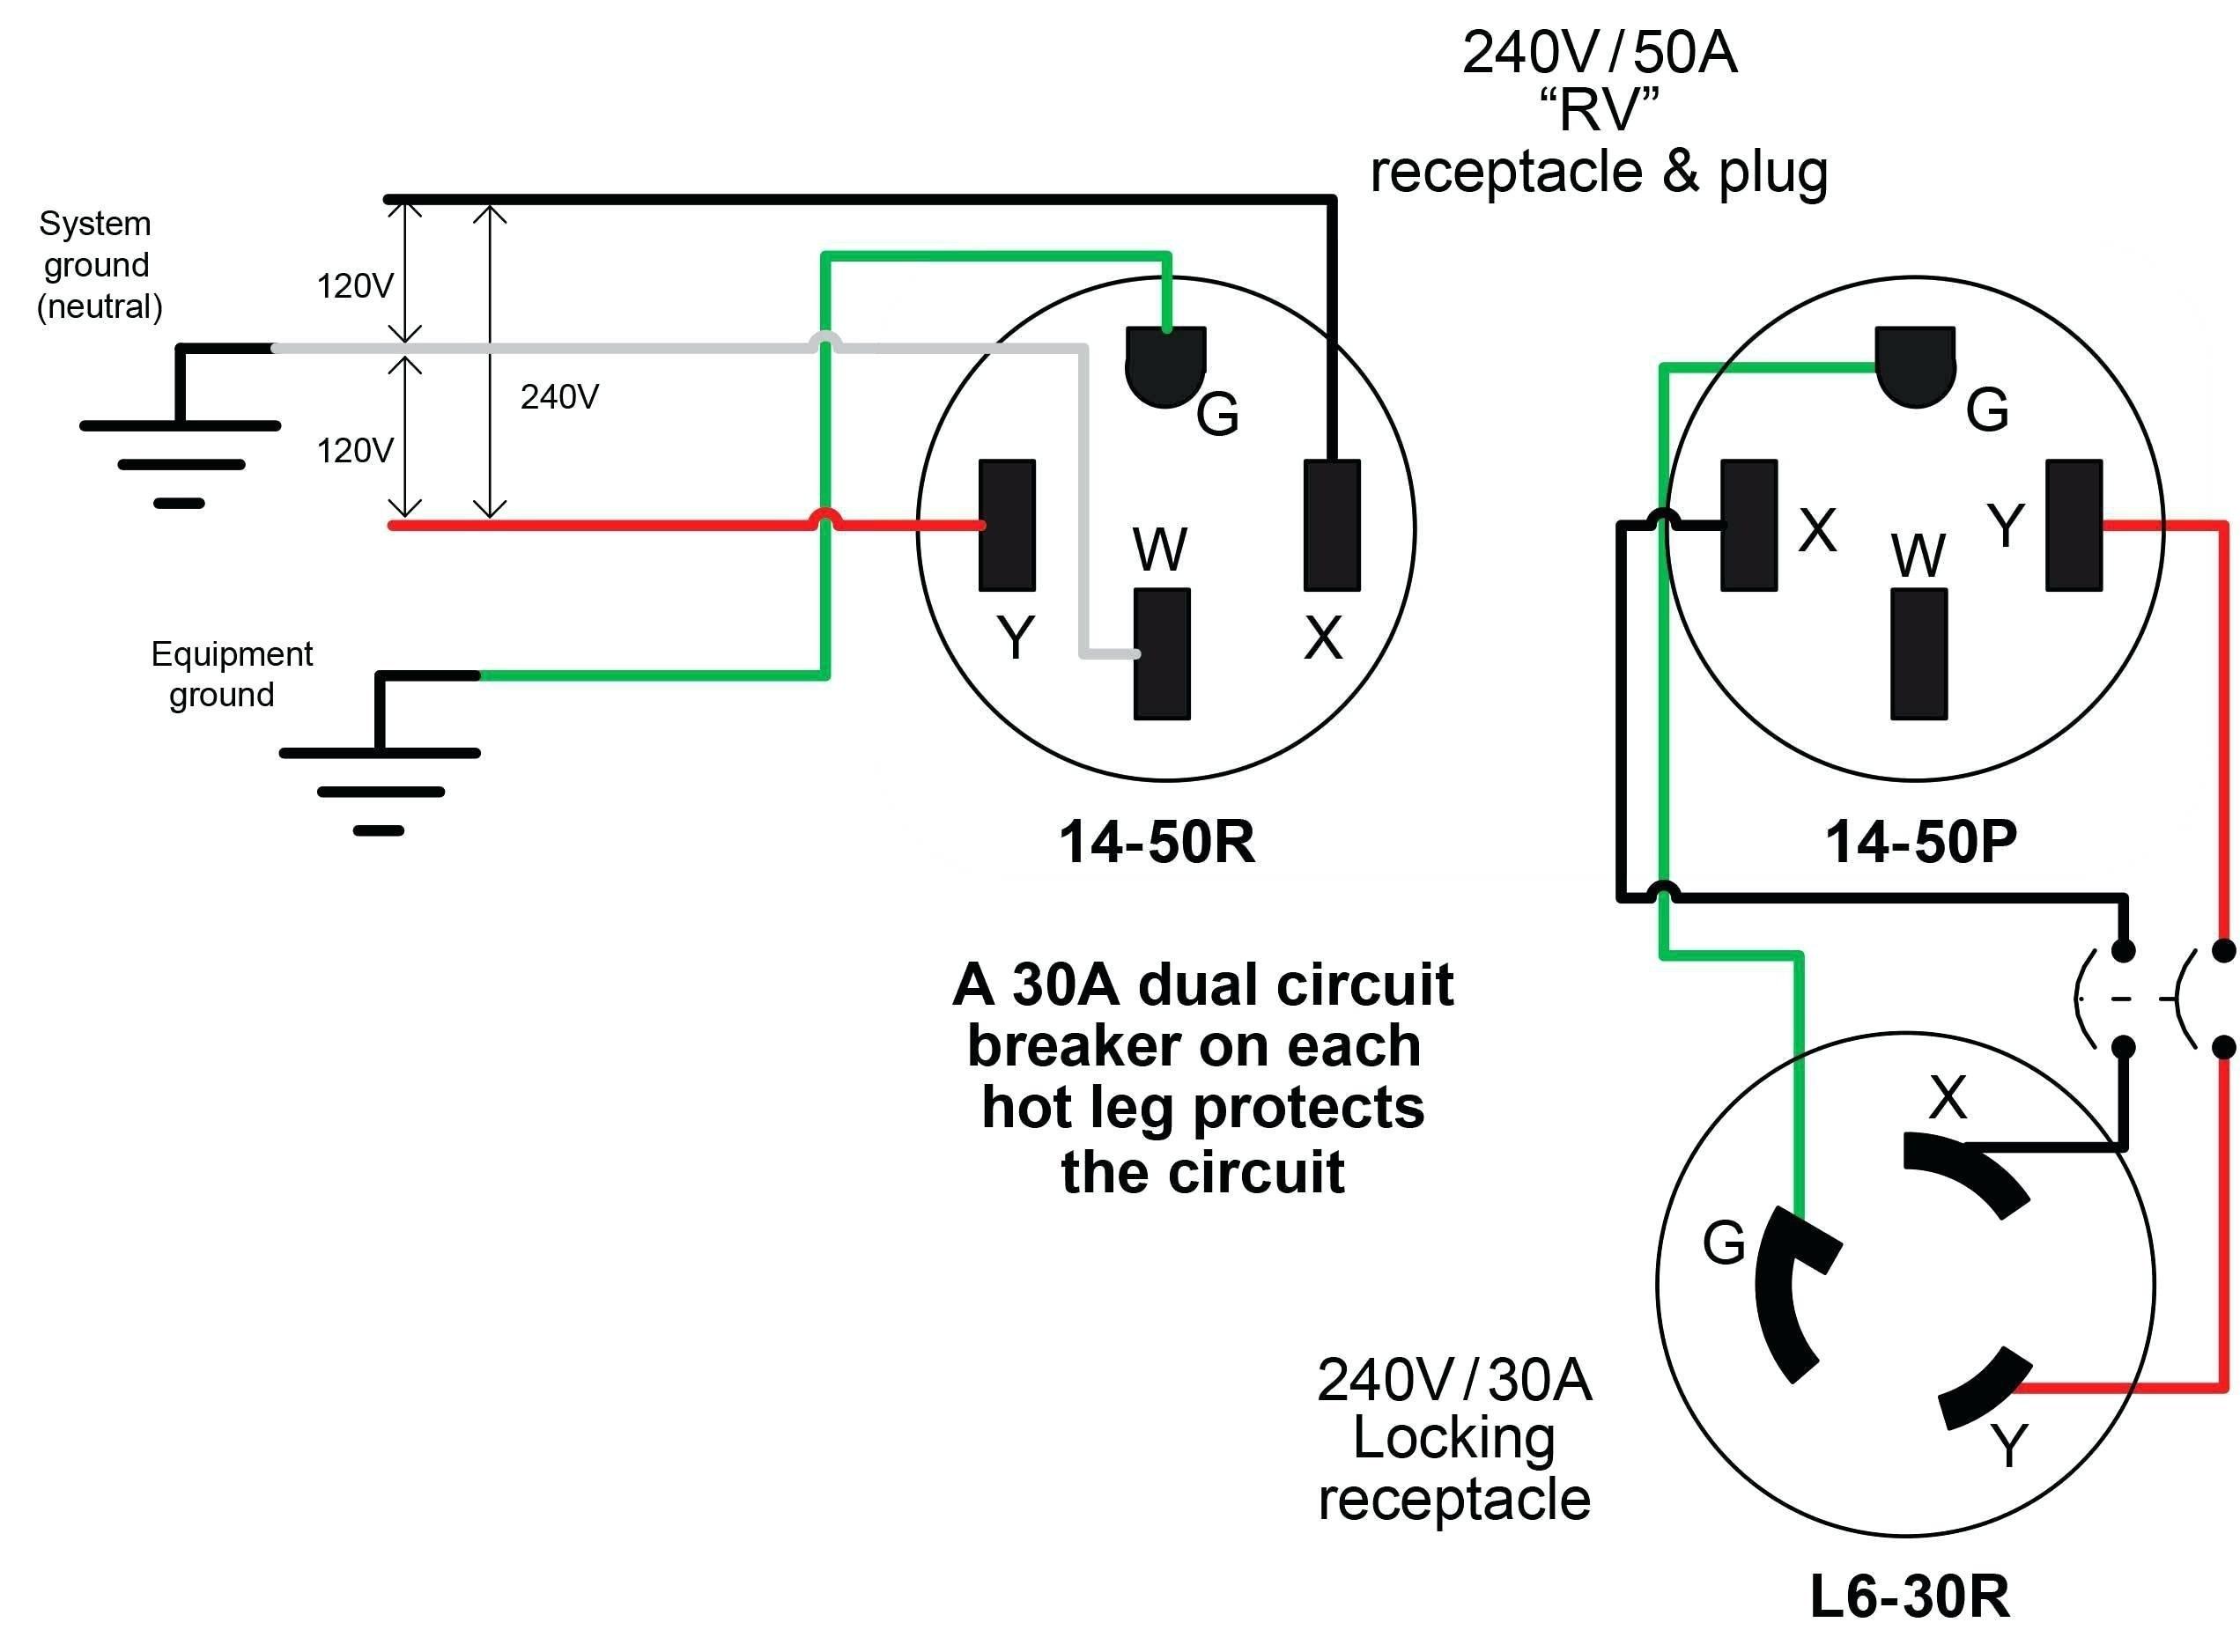 Monarch Dump Motor Wiring Diagram Bucher Hydraulics Wiring Diagram Of Monarch Dump Motor Wiring Diagram Mm 5922] Car Lift Hydraulic Pump Diagram Download Diagram